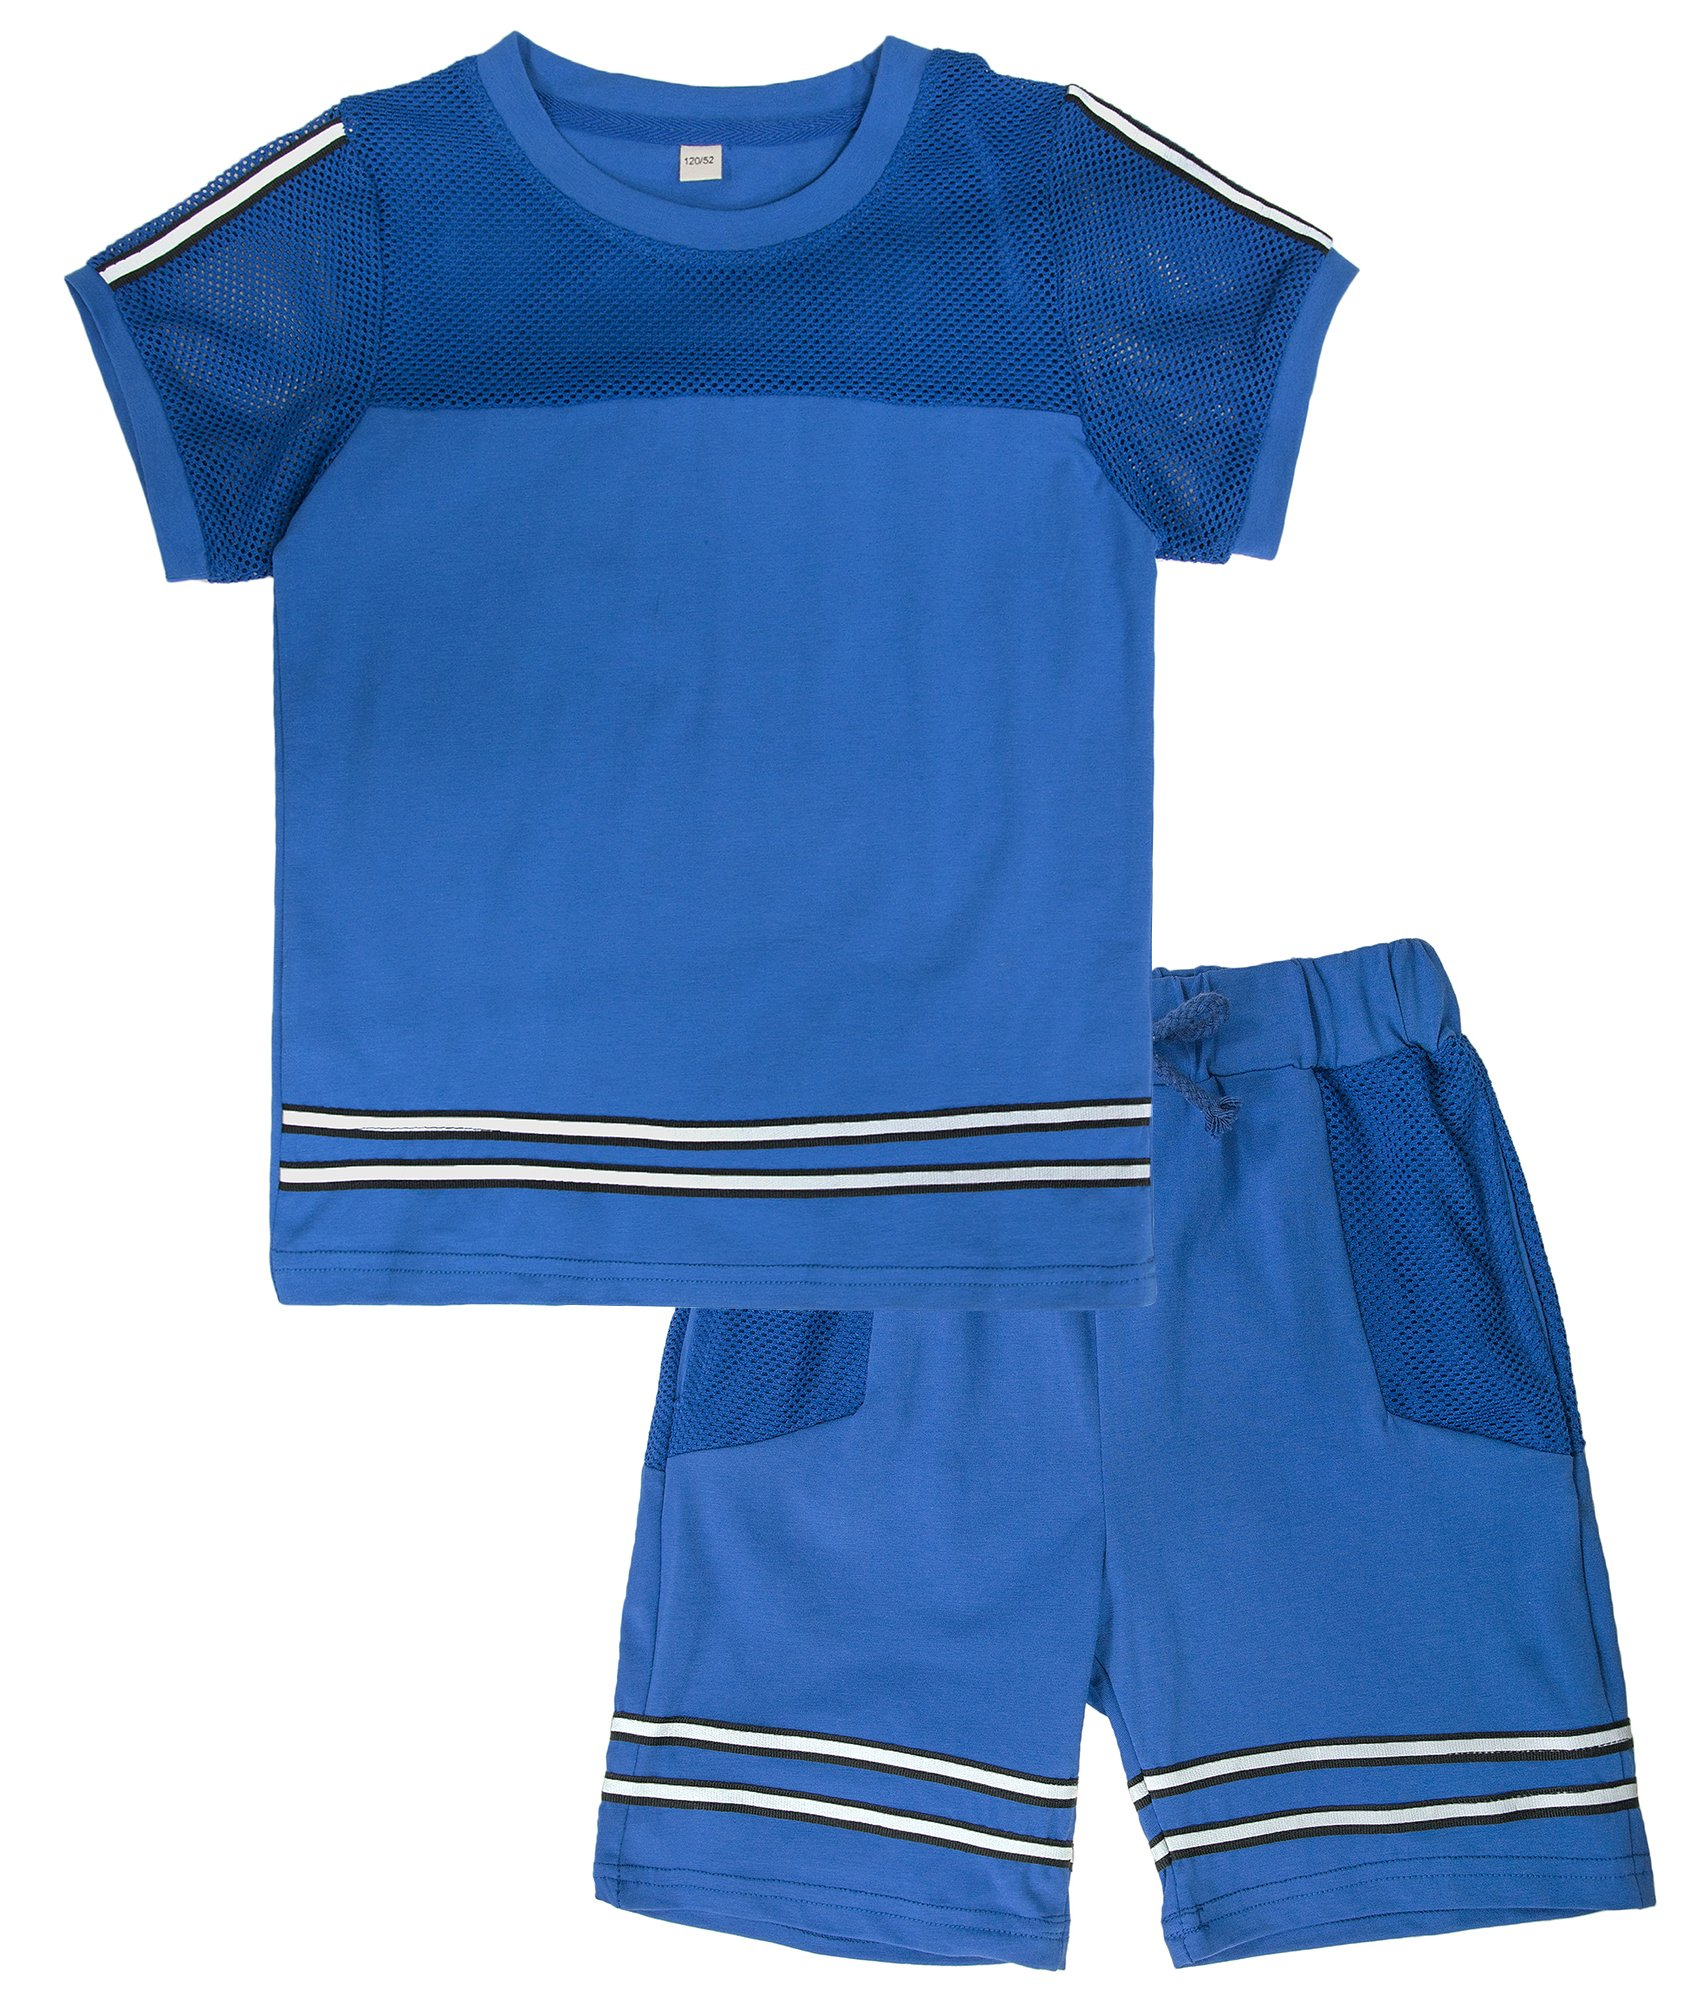 KISBINI Big Boys Breathable Summer Clothes Short Sleeve T-Shirt and Shorts Set Dark Blue 8T